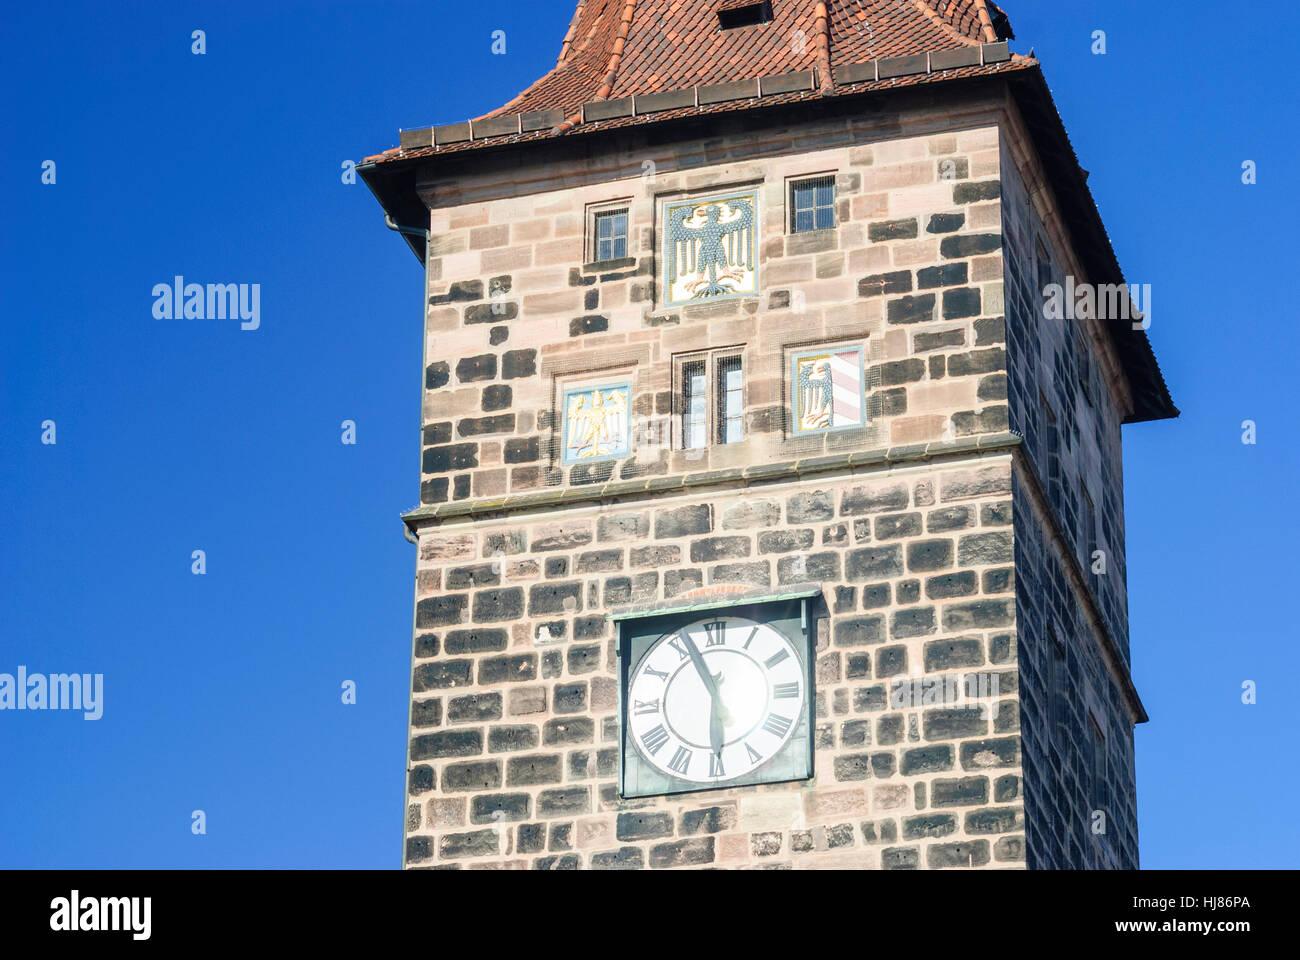 Nürnberg, Nuremberg: old town; Laufer Schlagturm tower, Mittelfranken, Middle Franconia, Bayern, Bavaria, Germany - Stock Image